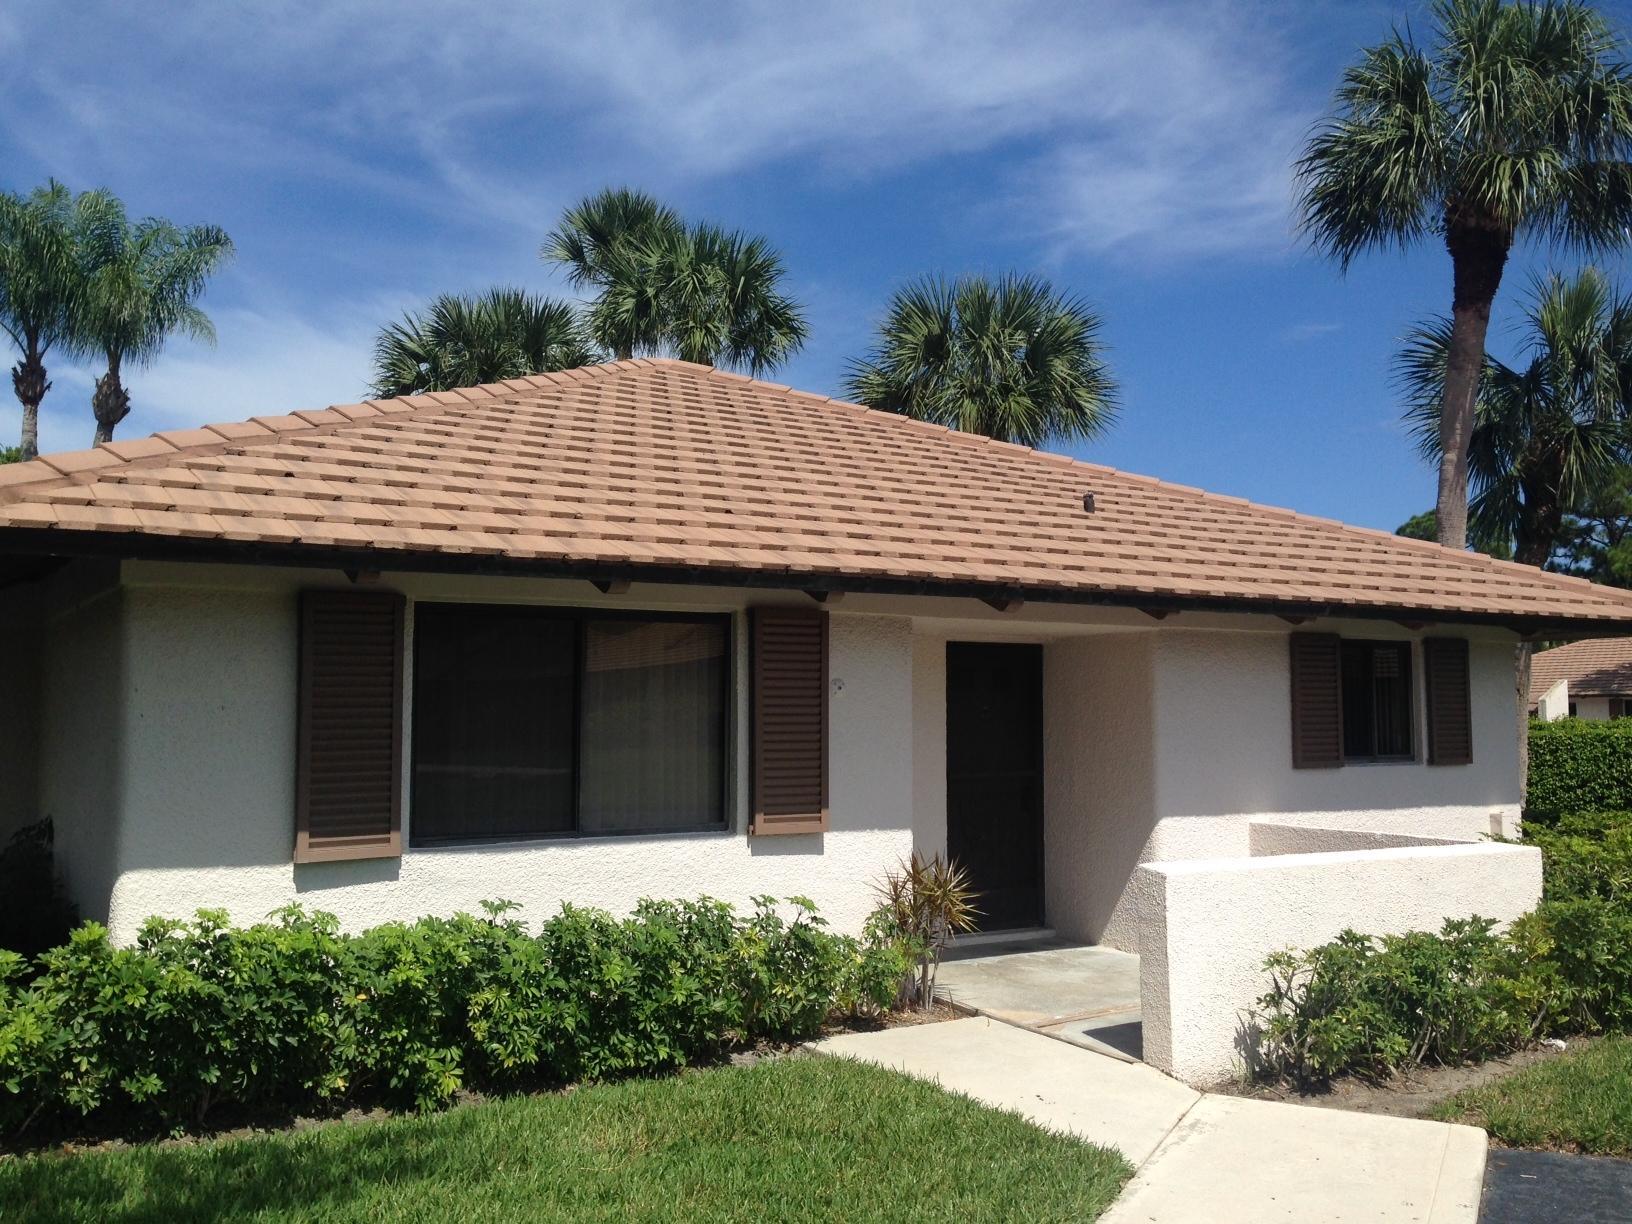 835 Club Drive, Palm Beach Gardens, Florida 33418, 2 Bedrooms Bedrooms, ,2 BathroomsBathrooms,F,Villa,Club,RX-10706970